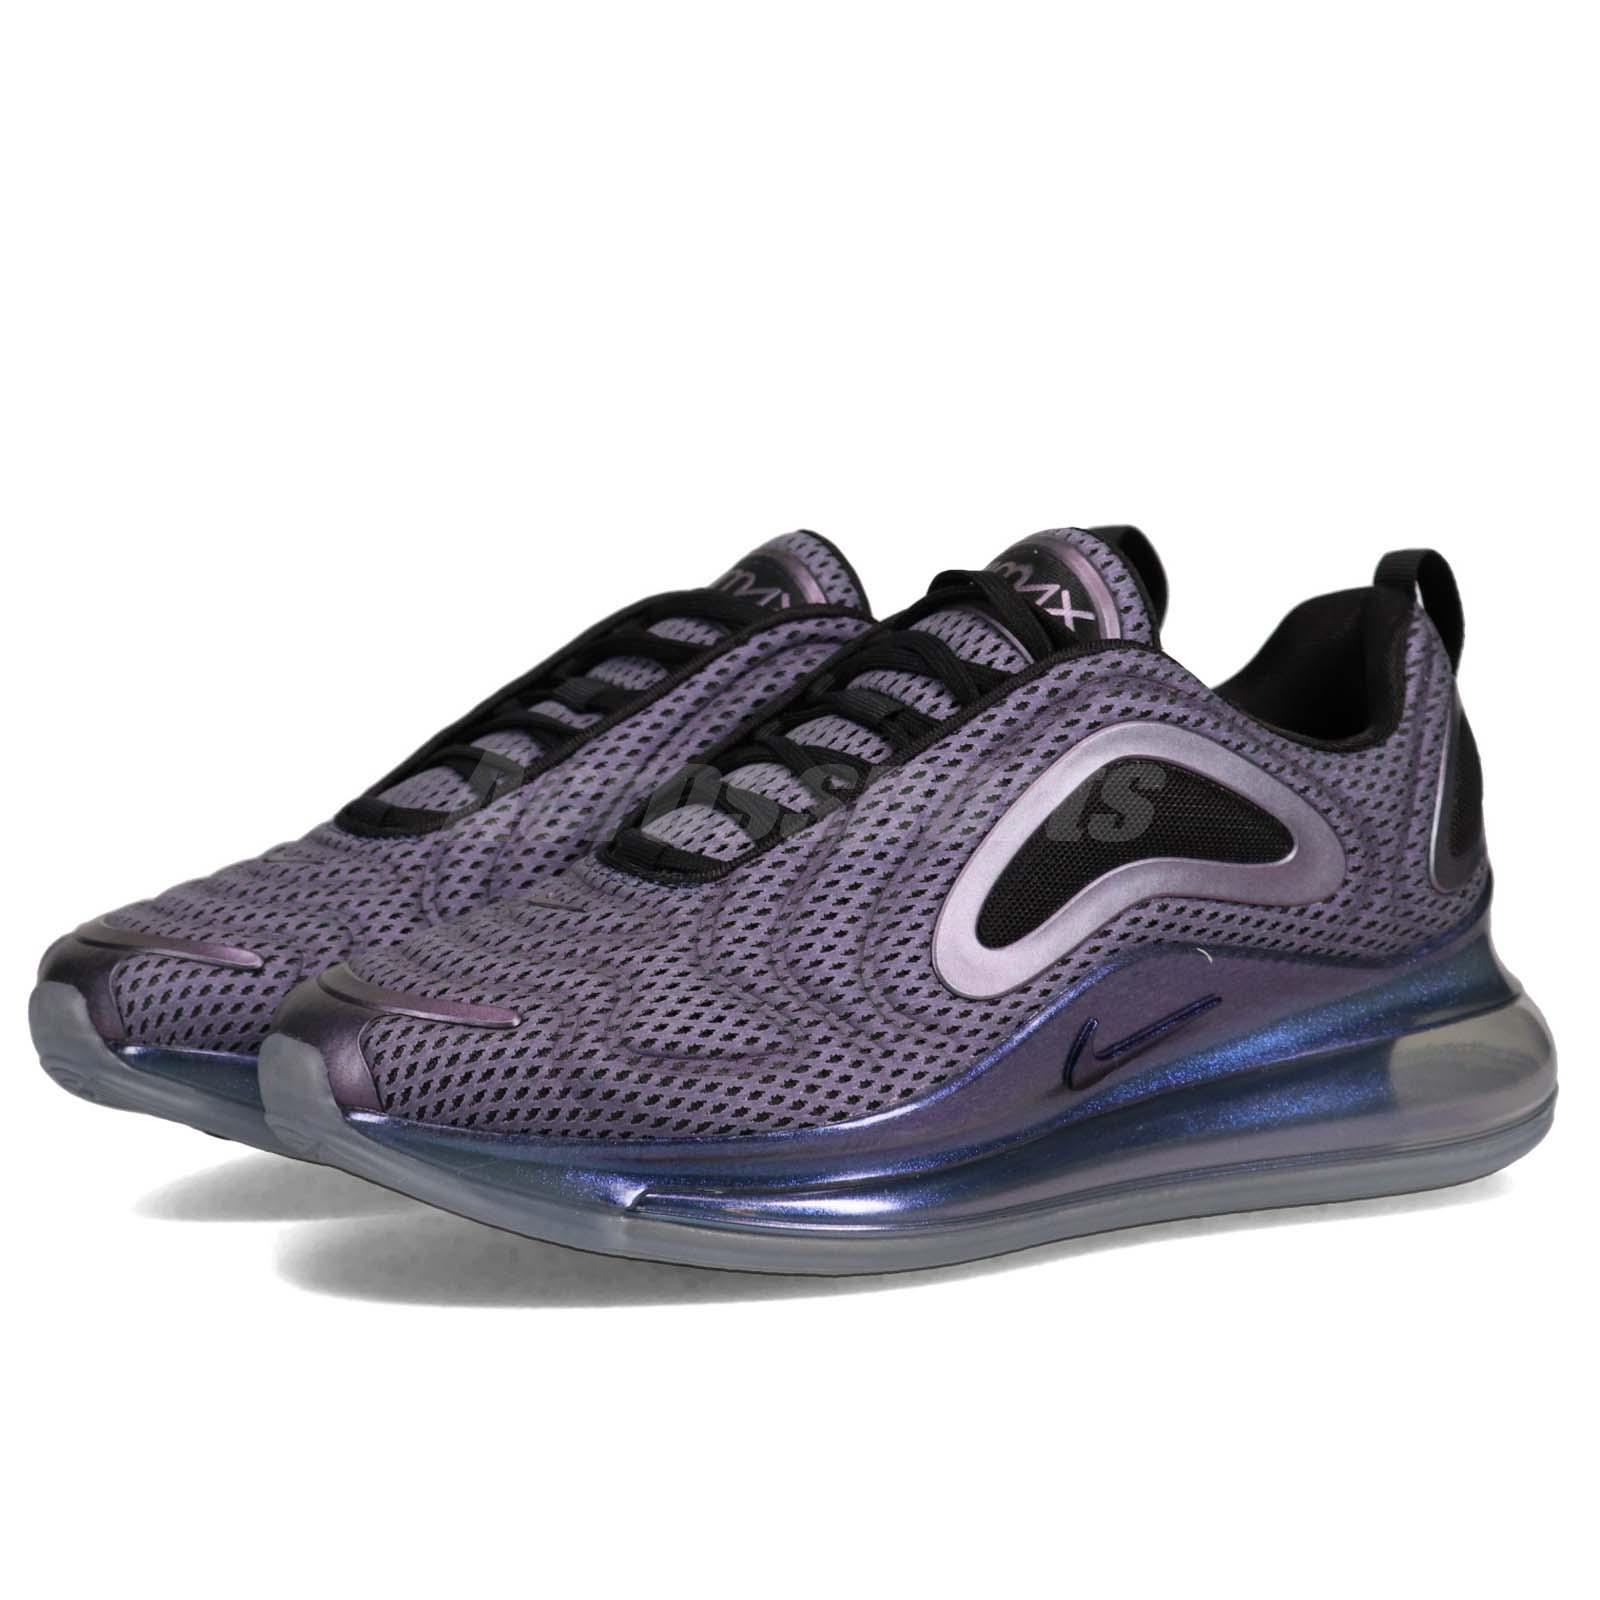 Detalles acerca de Nike Air Max 720 Zapatos Deportivos Northern Lights noche hombres tenis AO2924 001 mostrar título original